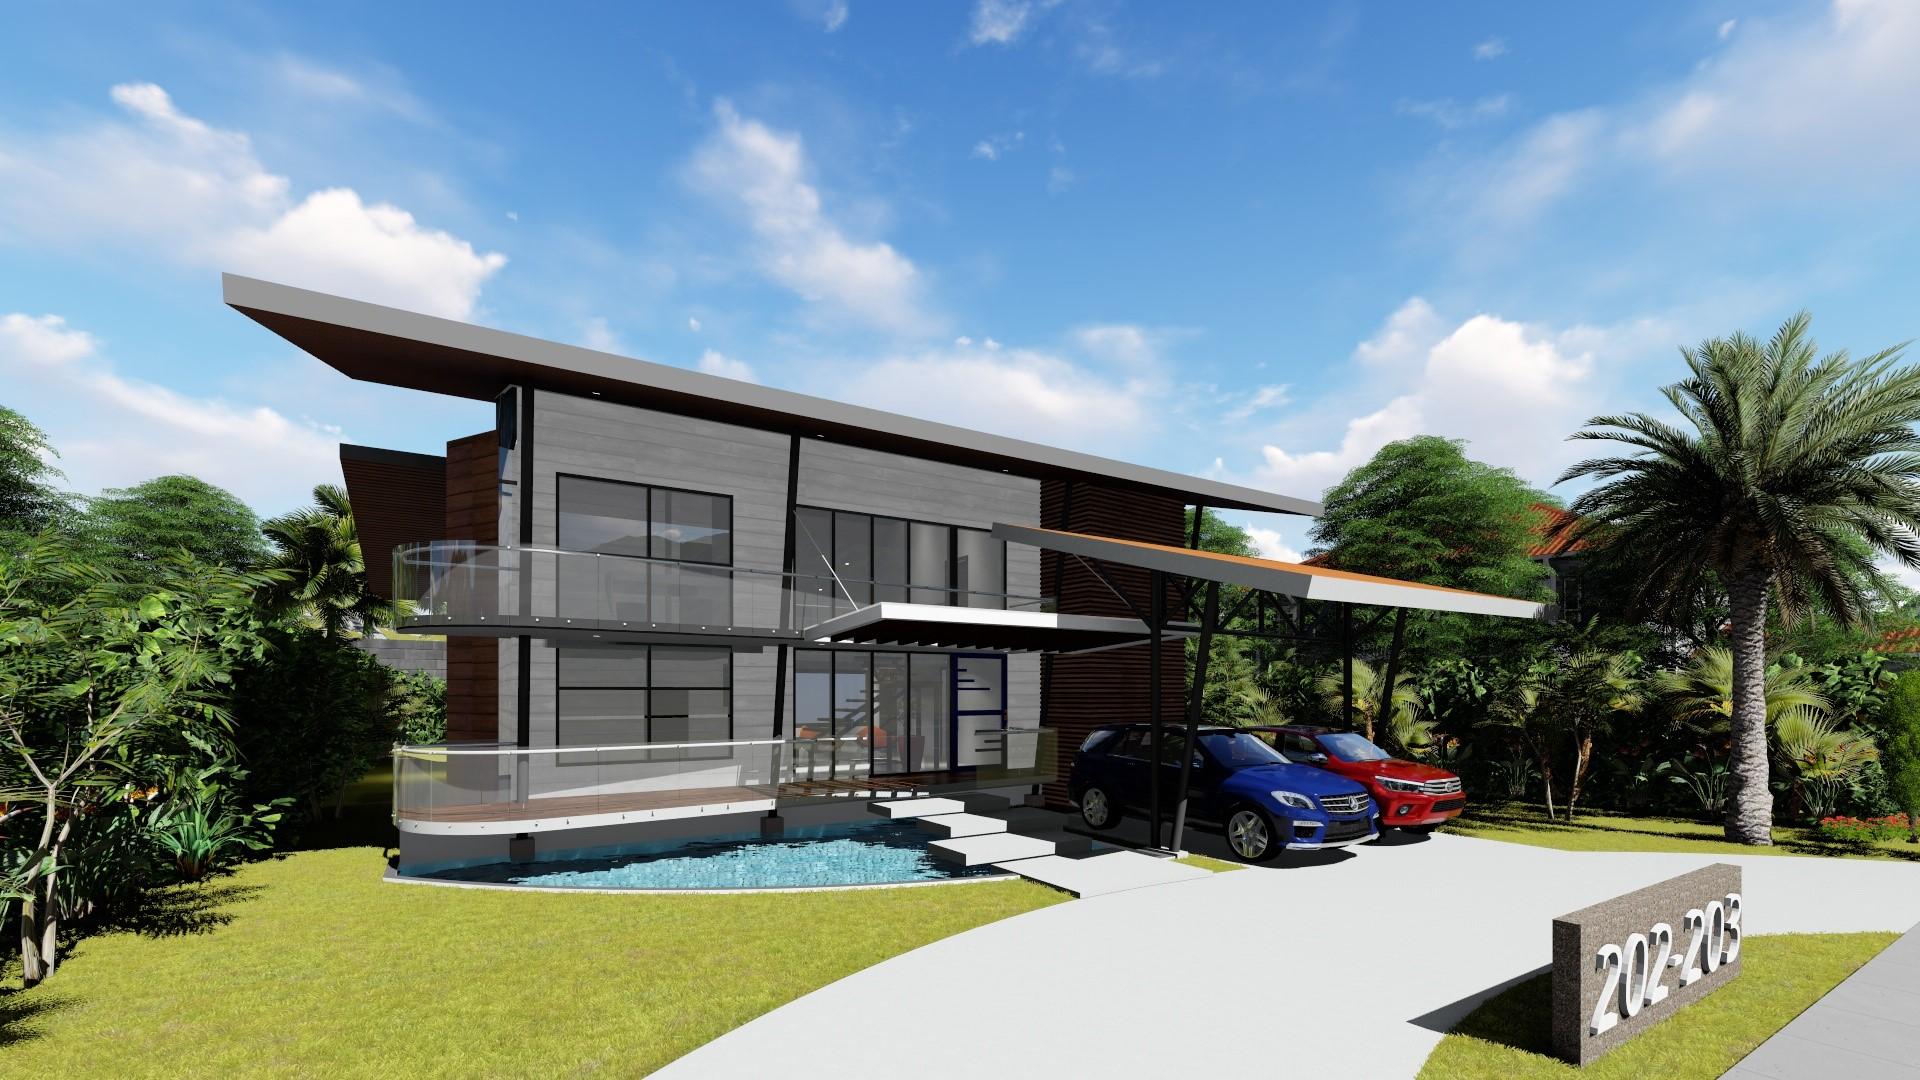 202-203 House